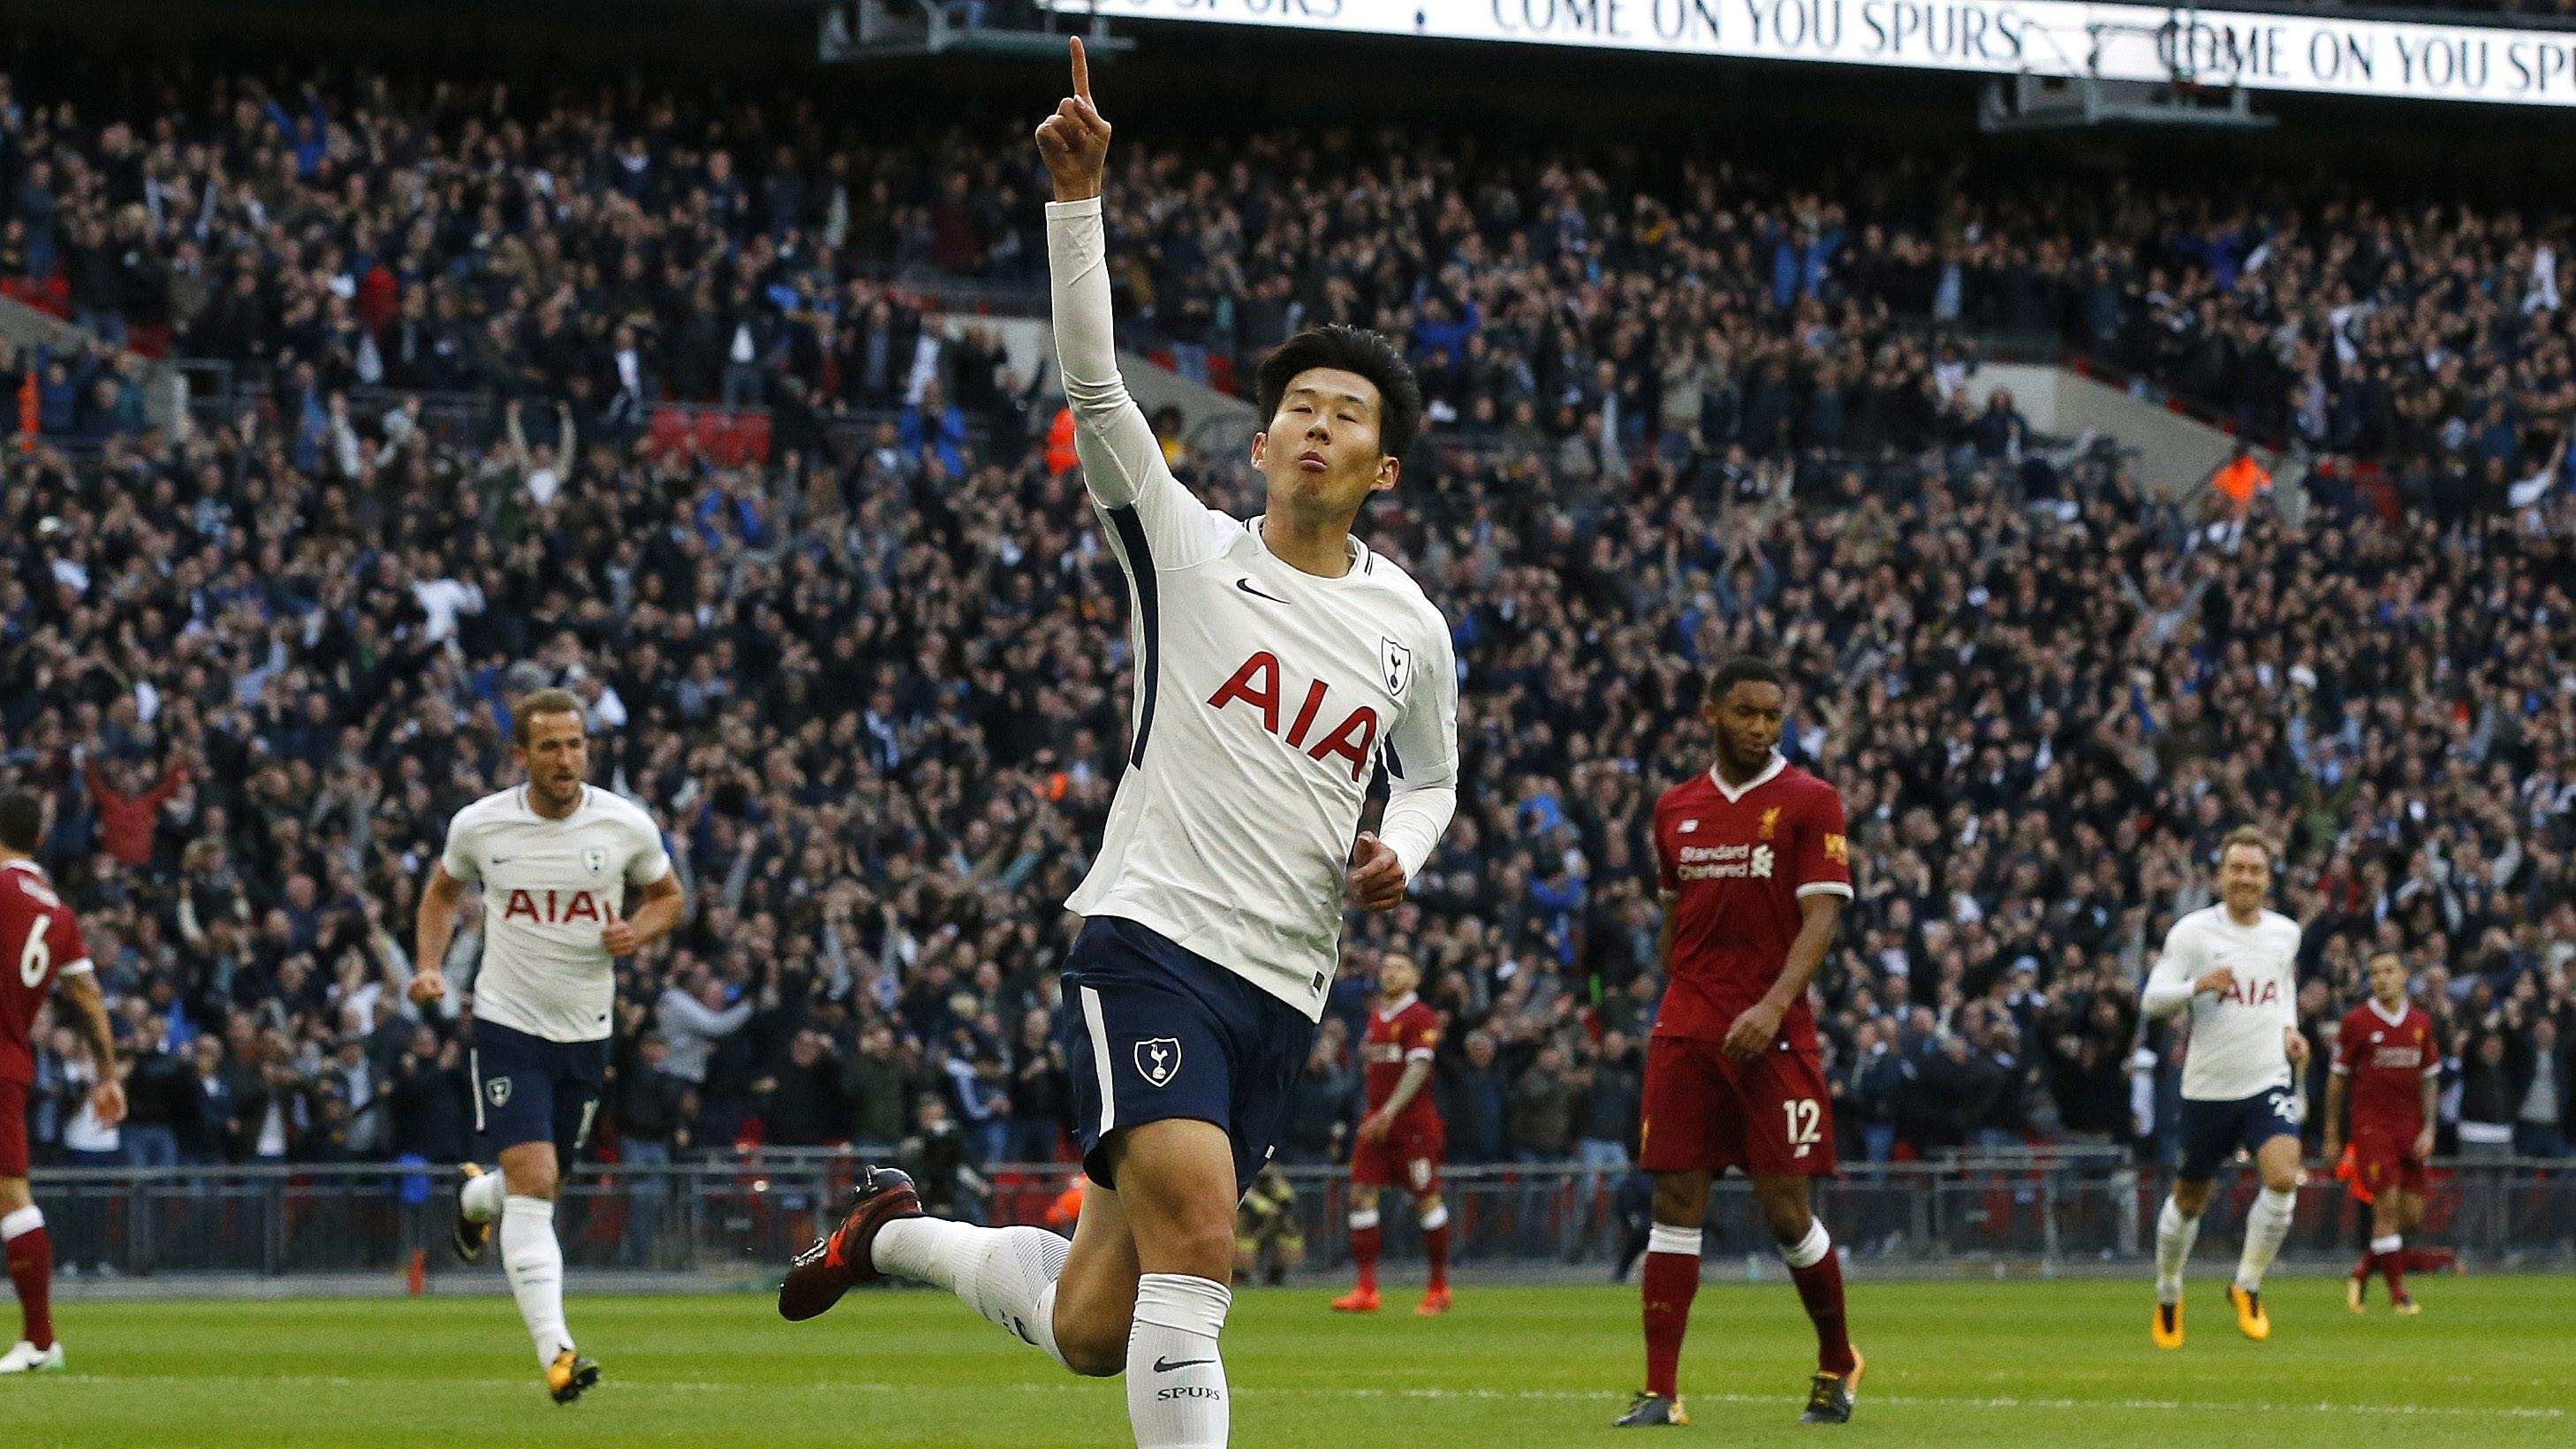 Pemain Tottenham, Son Heung-min (AP/Frank Augstein)